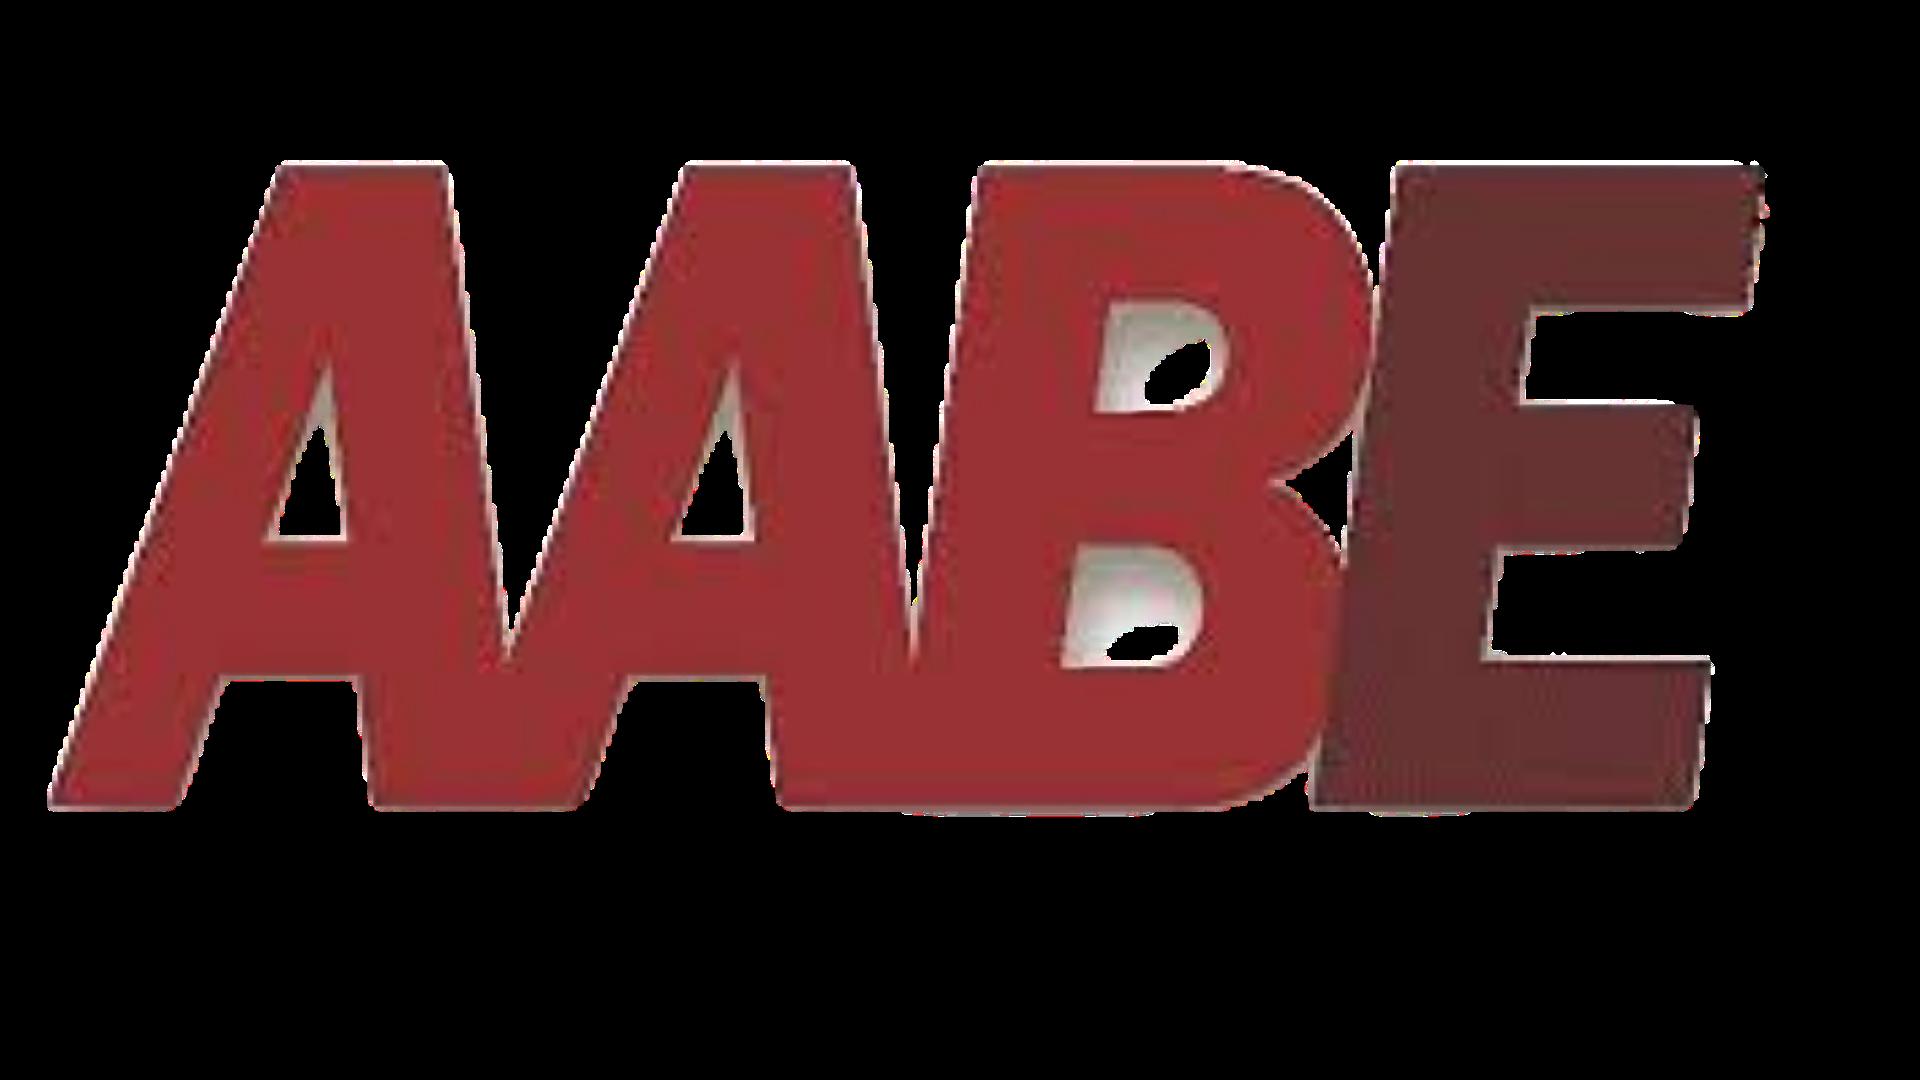 Logo for American Association of Blacks in Energy (A.A.B.E.)